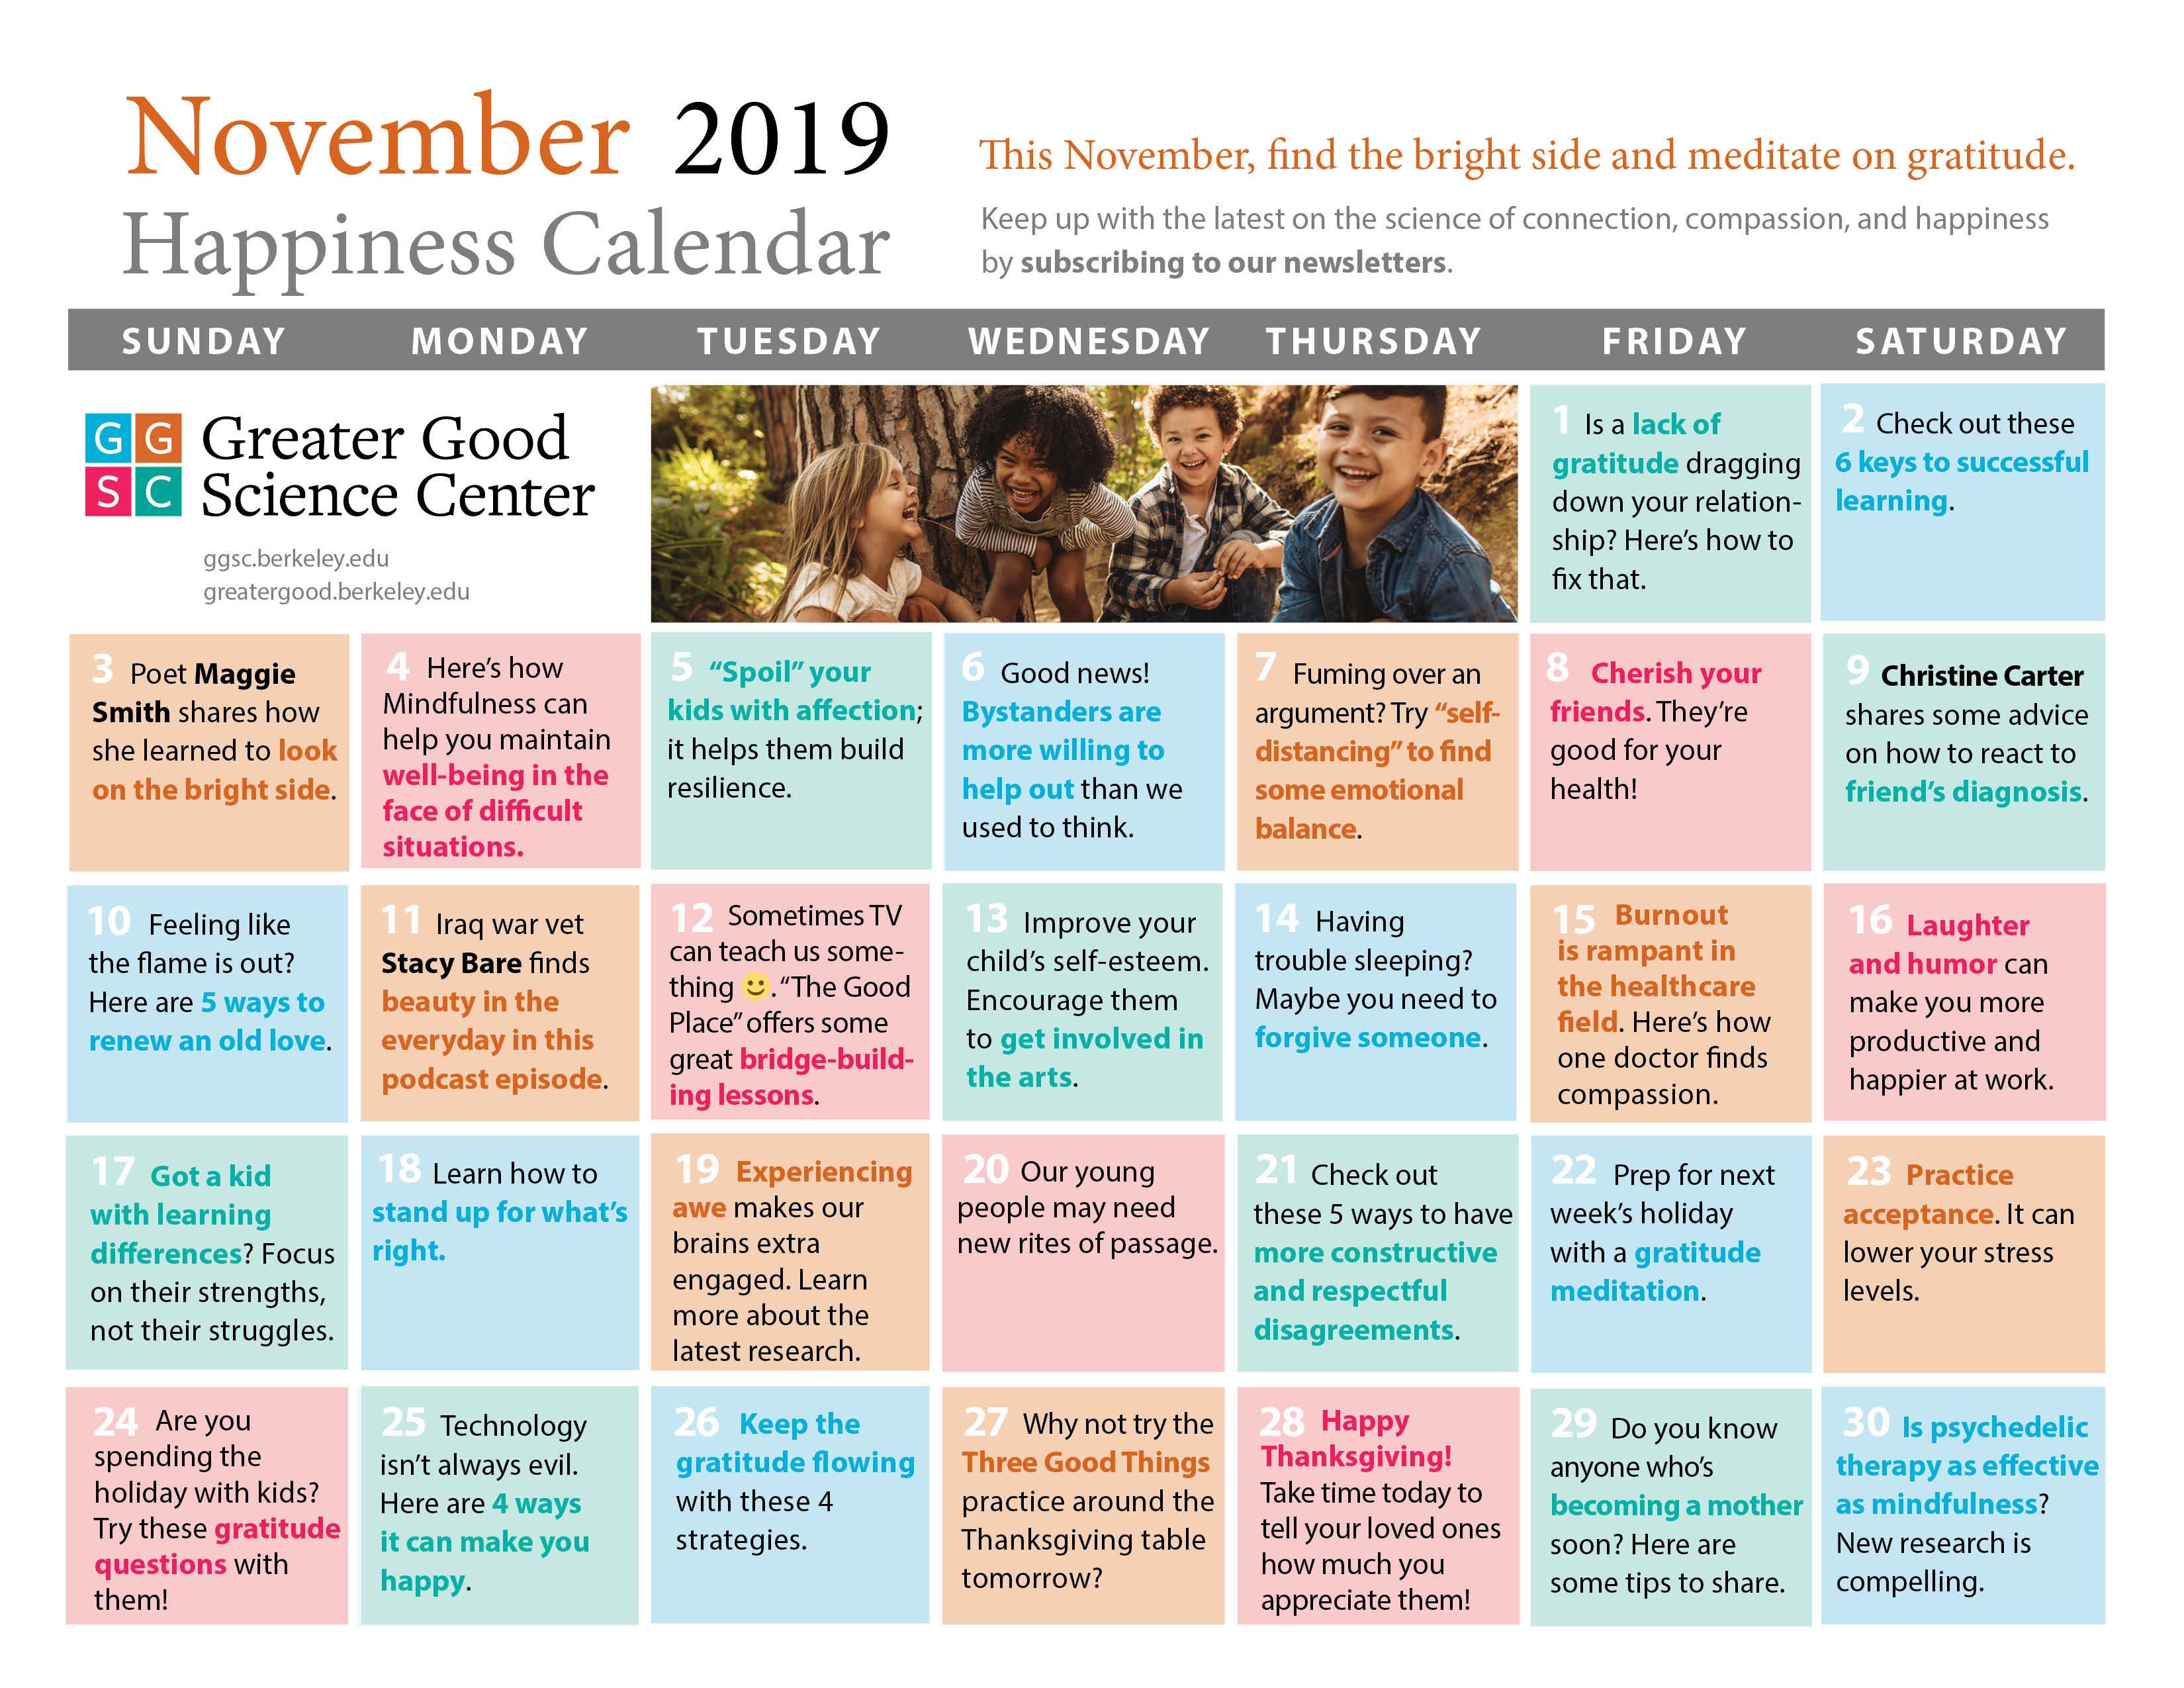 November 2019 Happiness Calendar